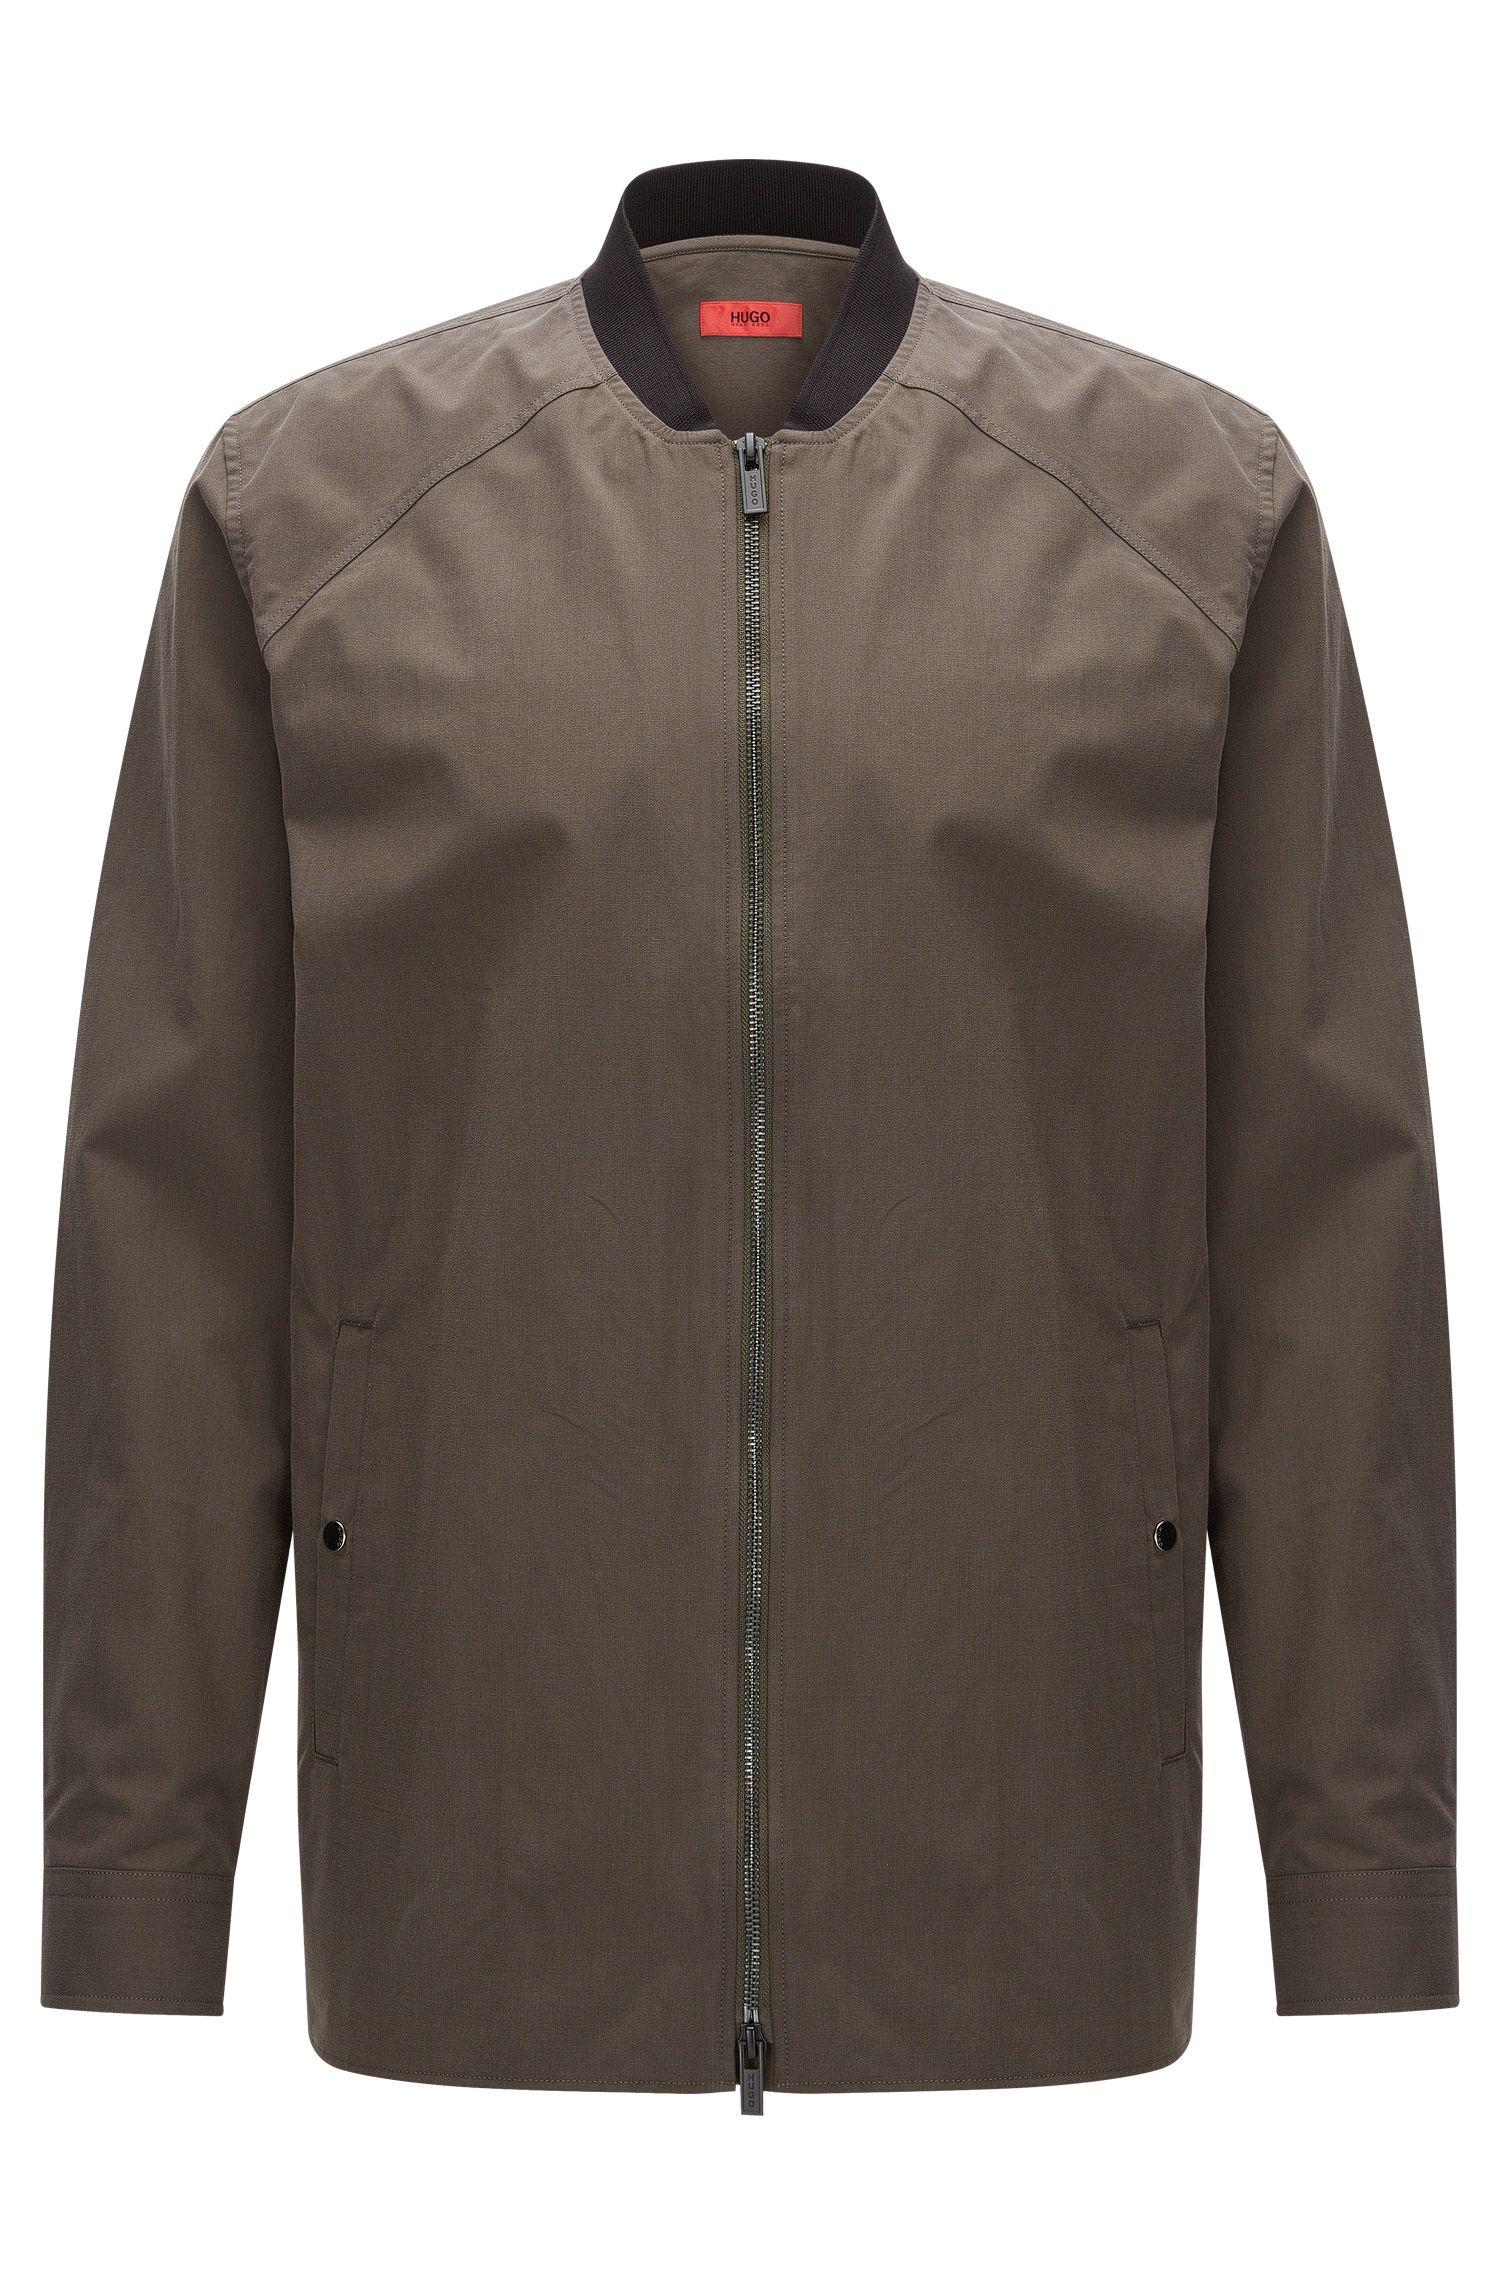 Relaxed-Fit Hemdjacke aus mittelschwerer Baumwolle